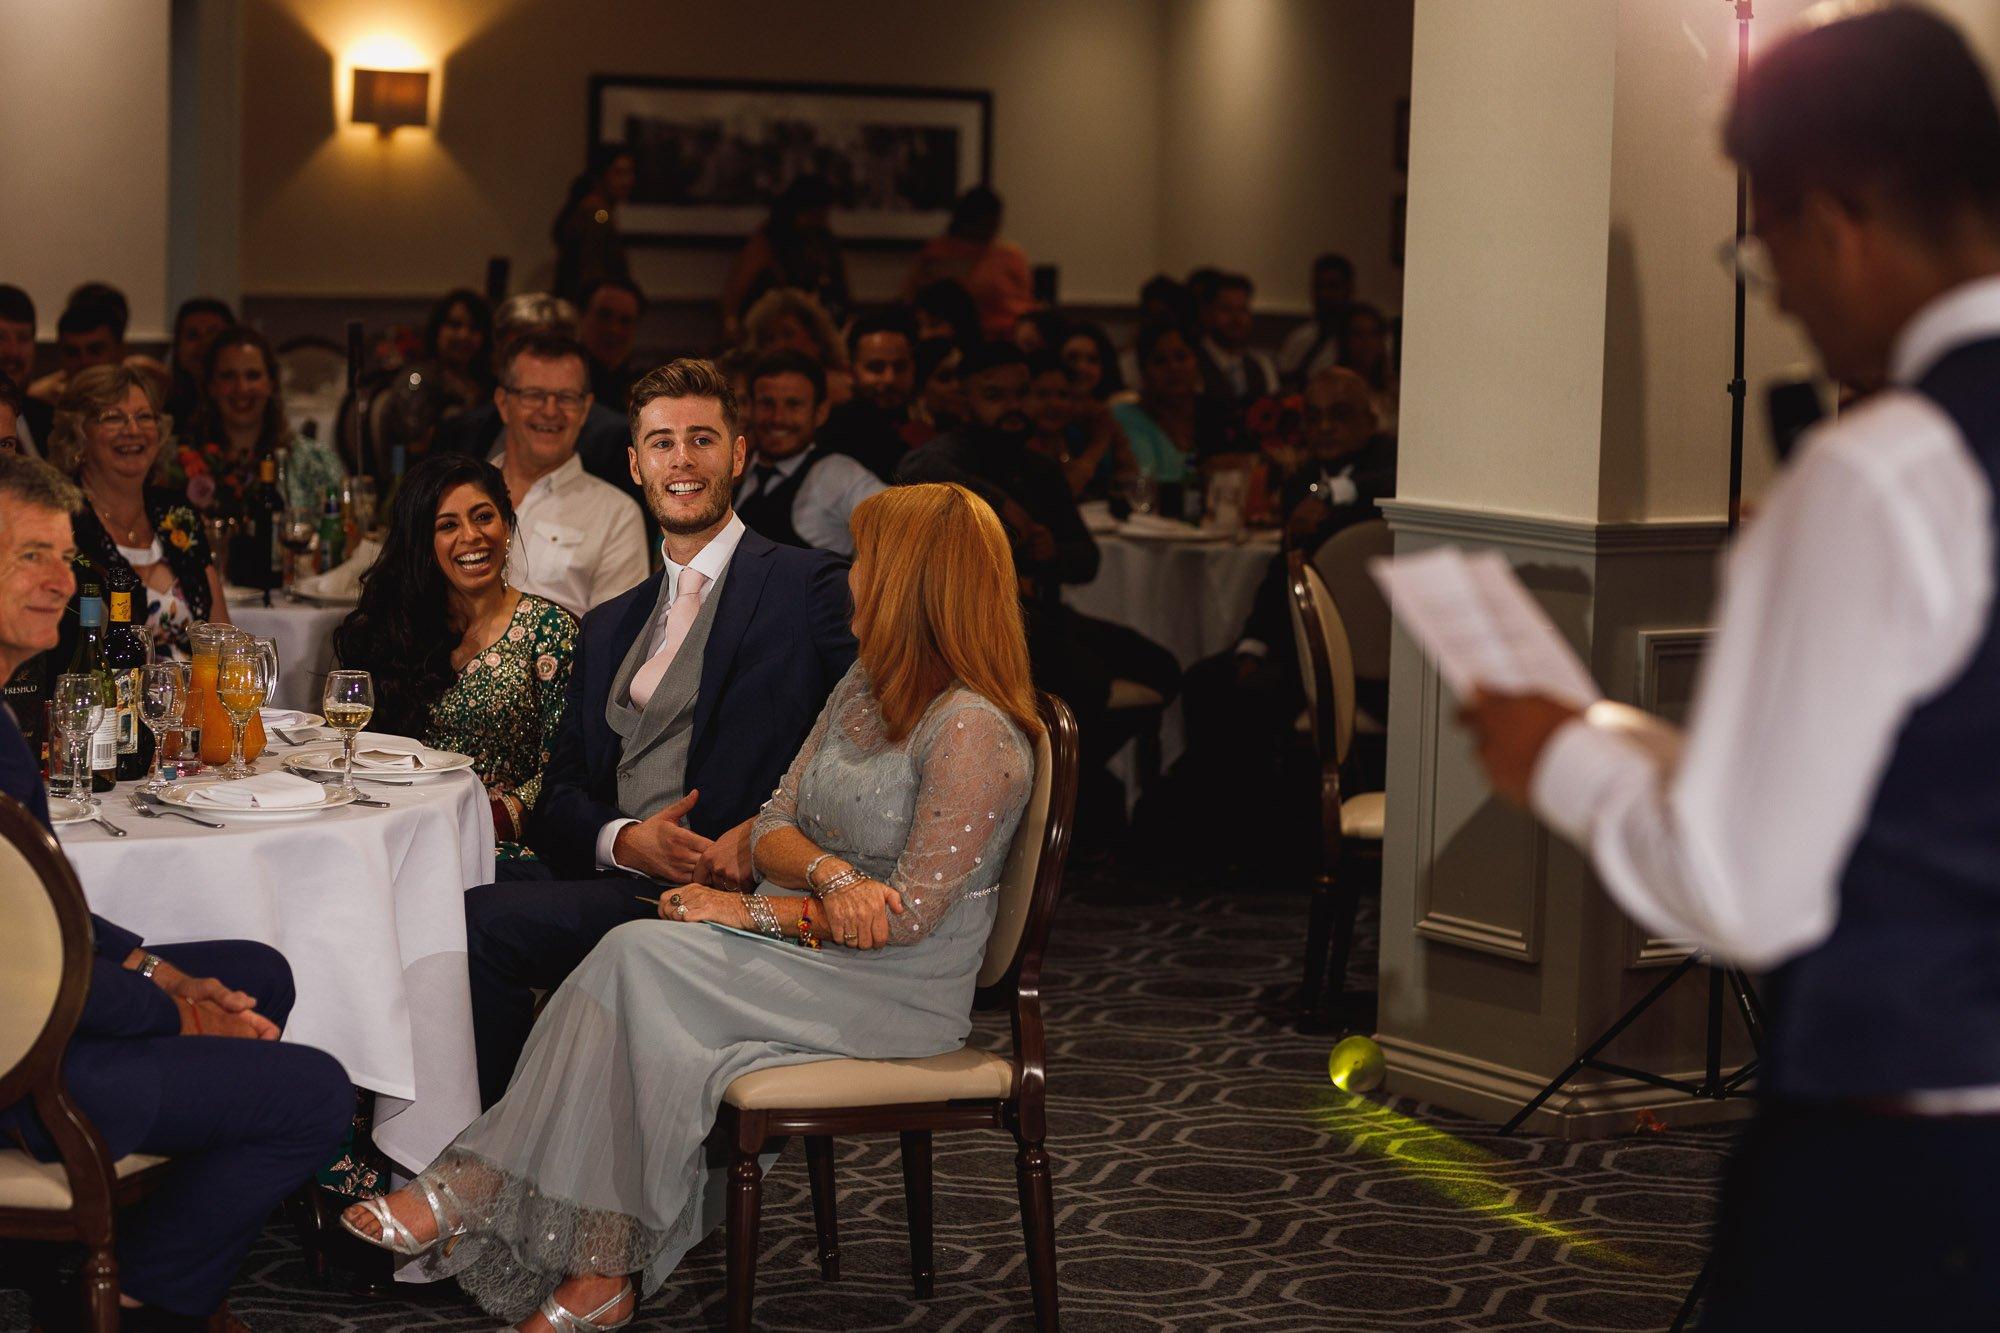 De Vere Wokefield Estate, Asian wedding photographer, reception, speech reactions